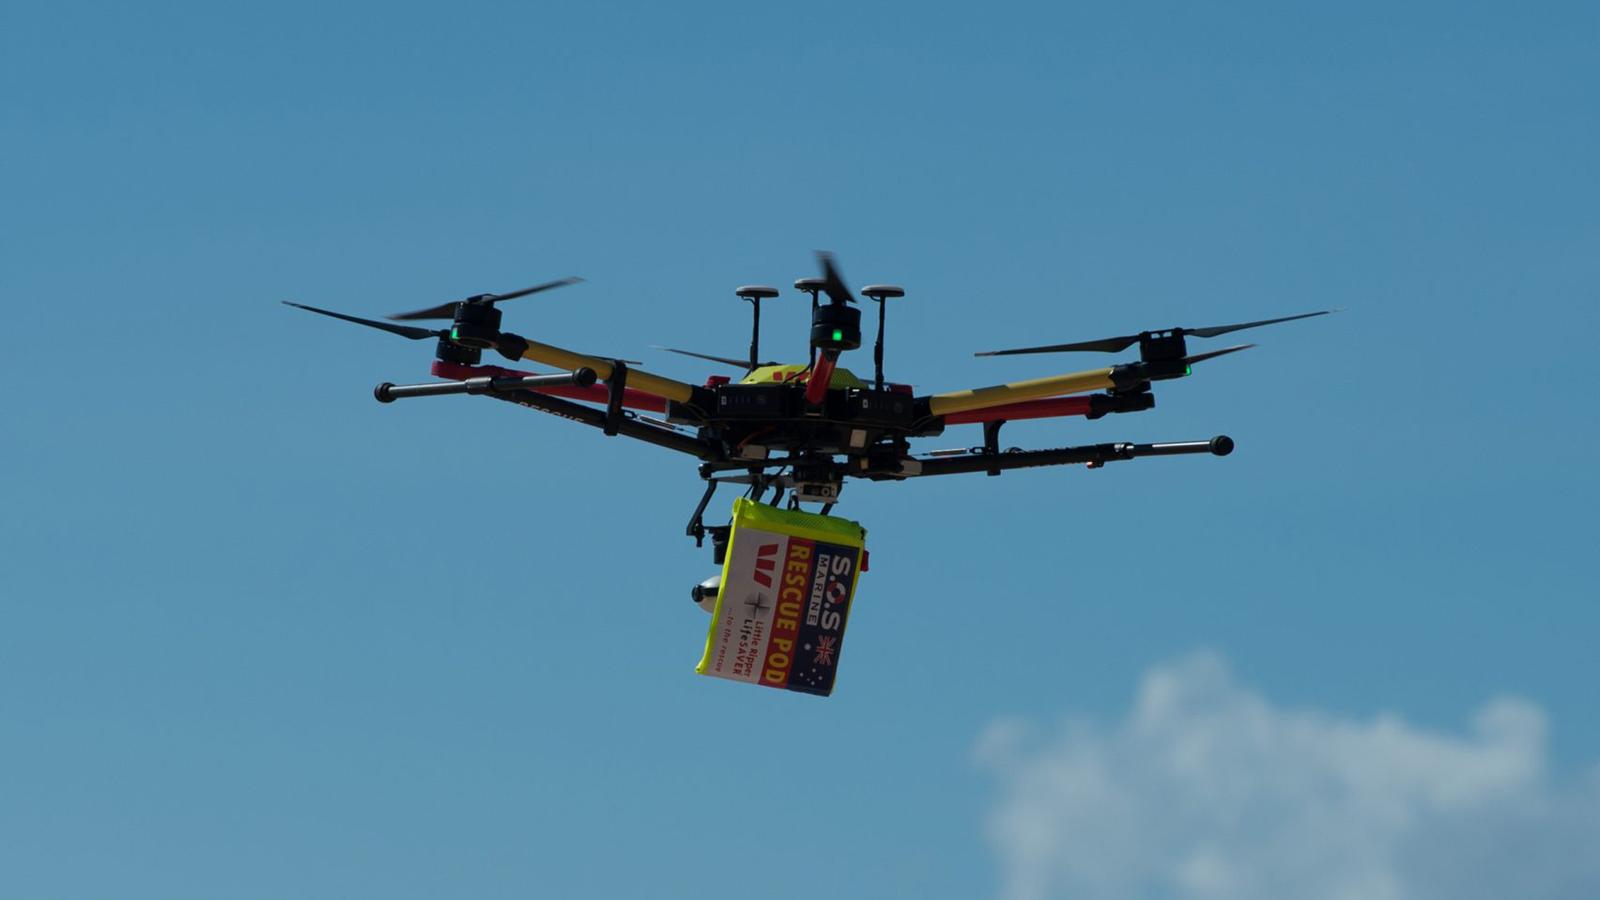 The 'Little Ripper' Rescue Drone. Source: dezeen.com